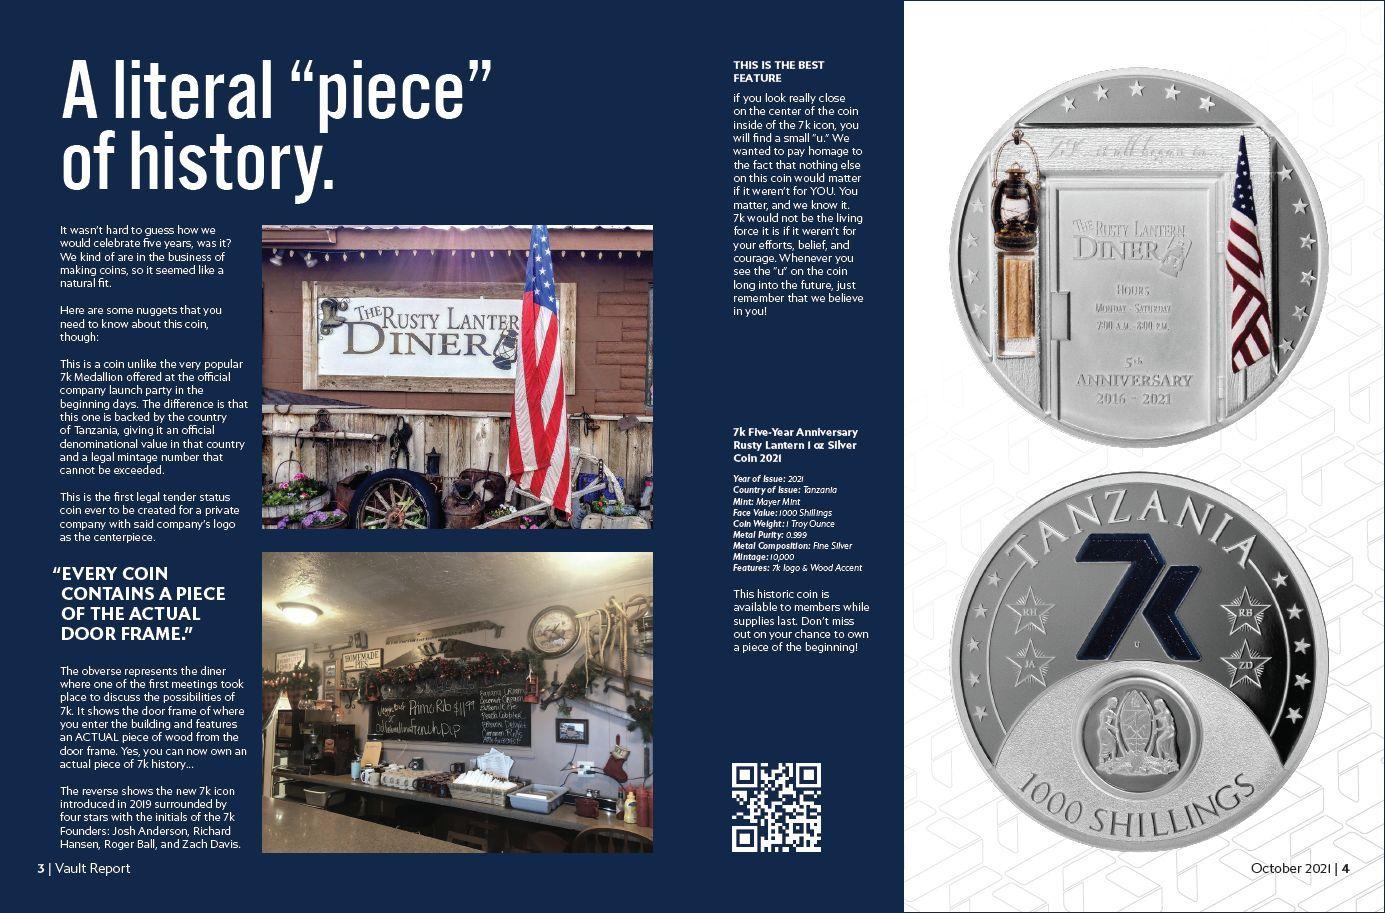 2021 Rusty Lantern 7k Anniversary 1oz Silver Coin